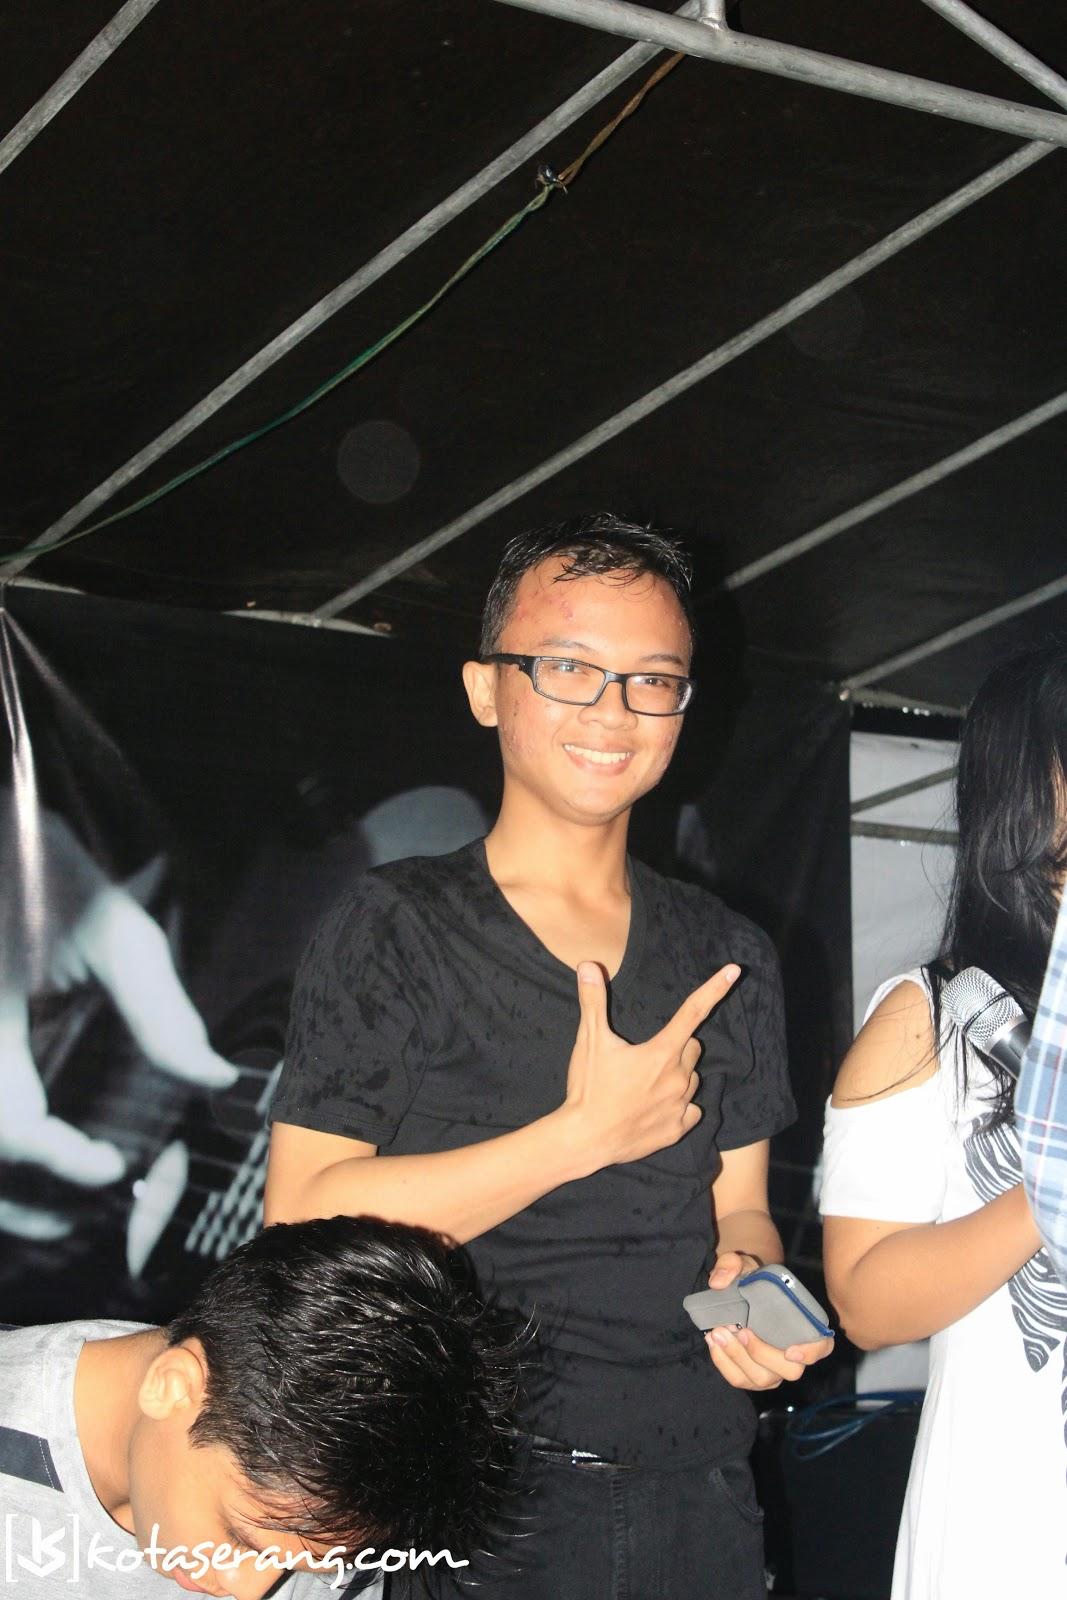 Event - Akustik Asik By: kedaiceriaa, CiRKoRM dan KotaSerang